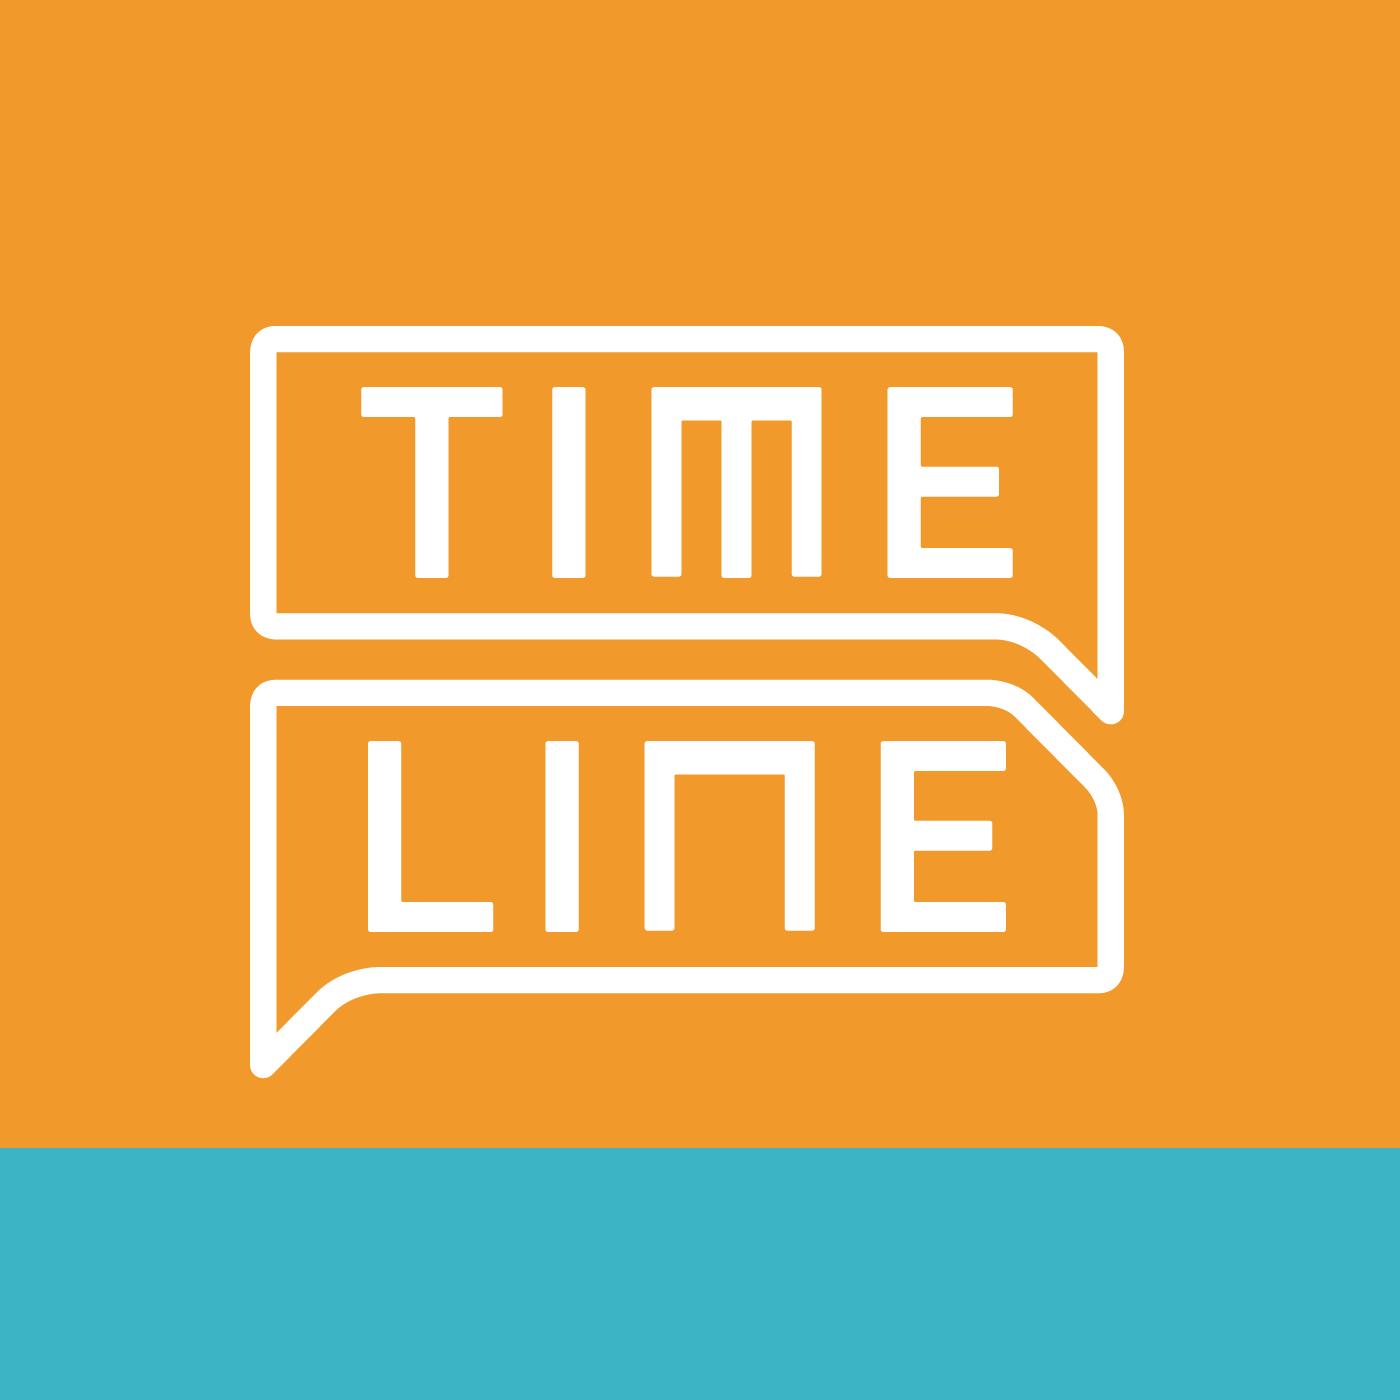 Timeline Gaúcha 22/01/2018